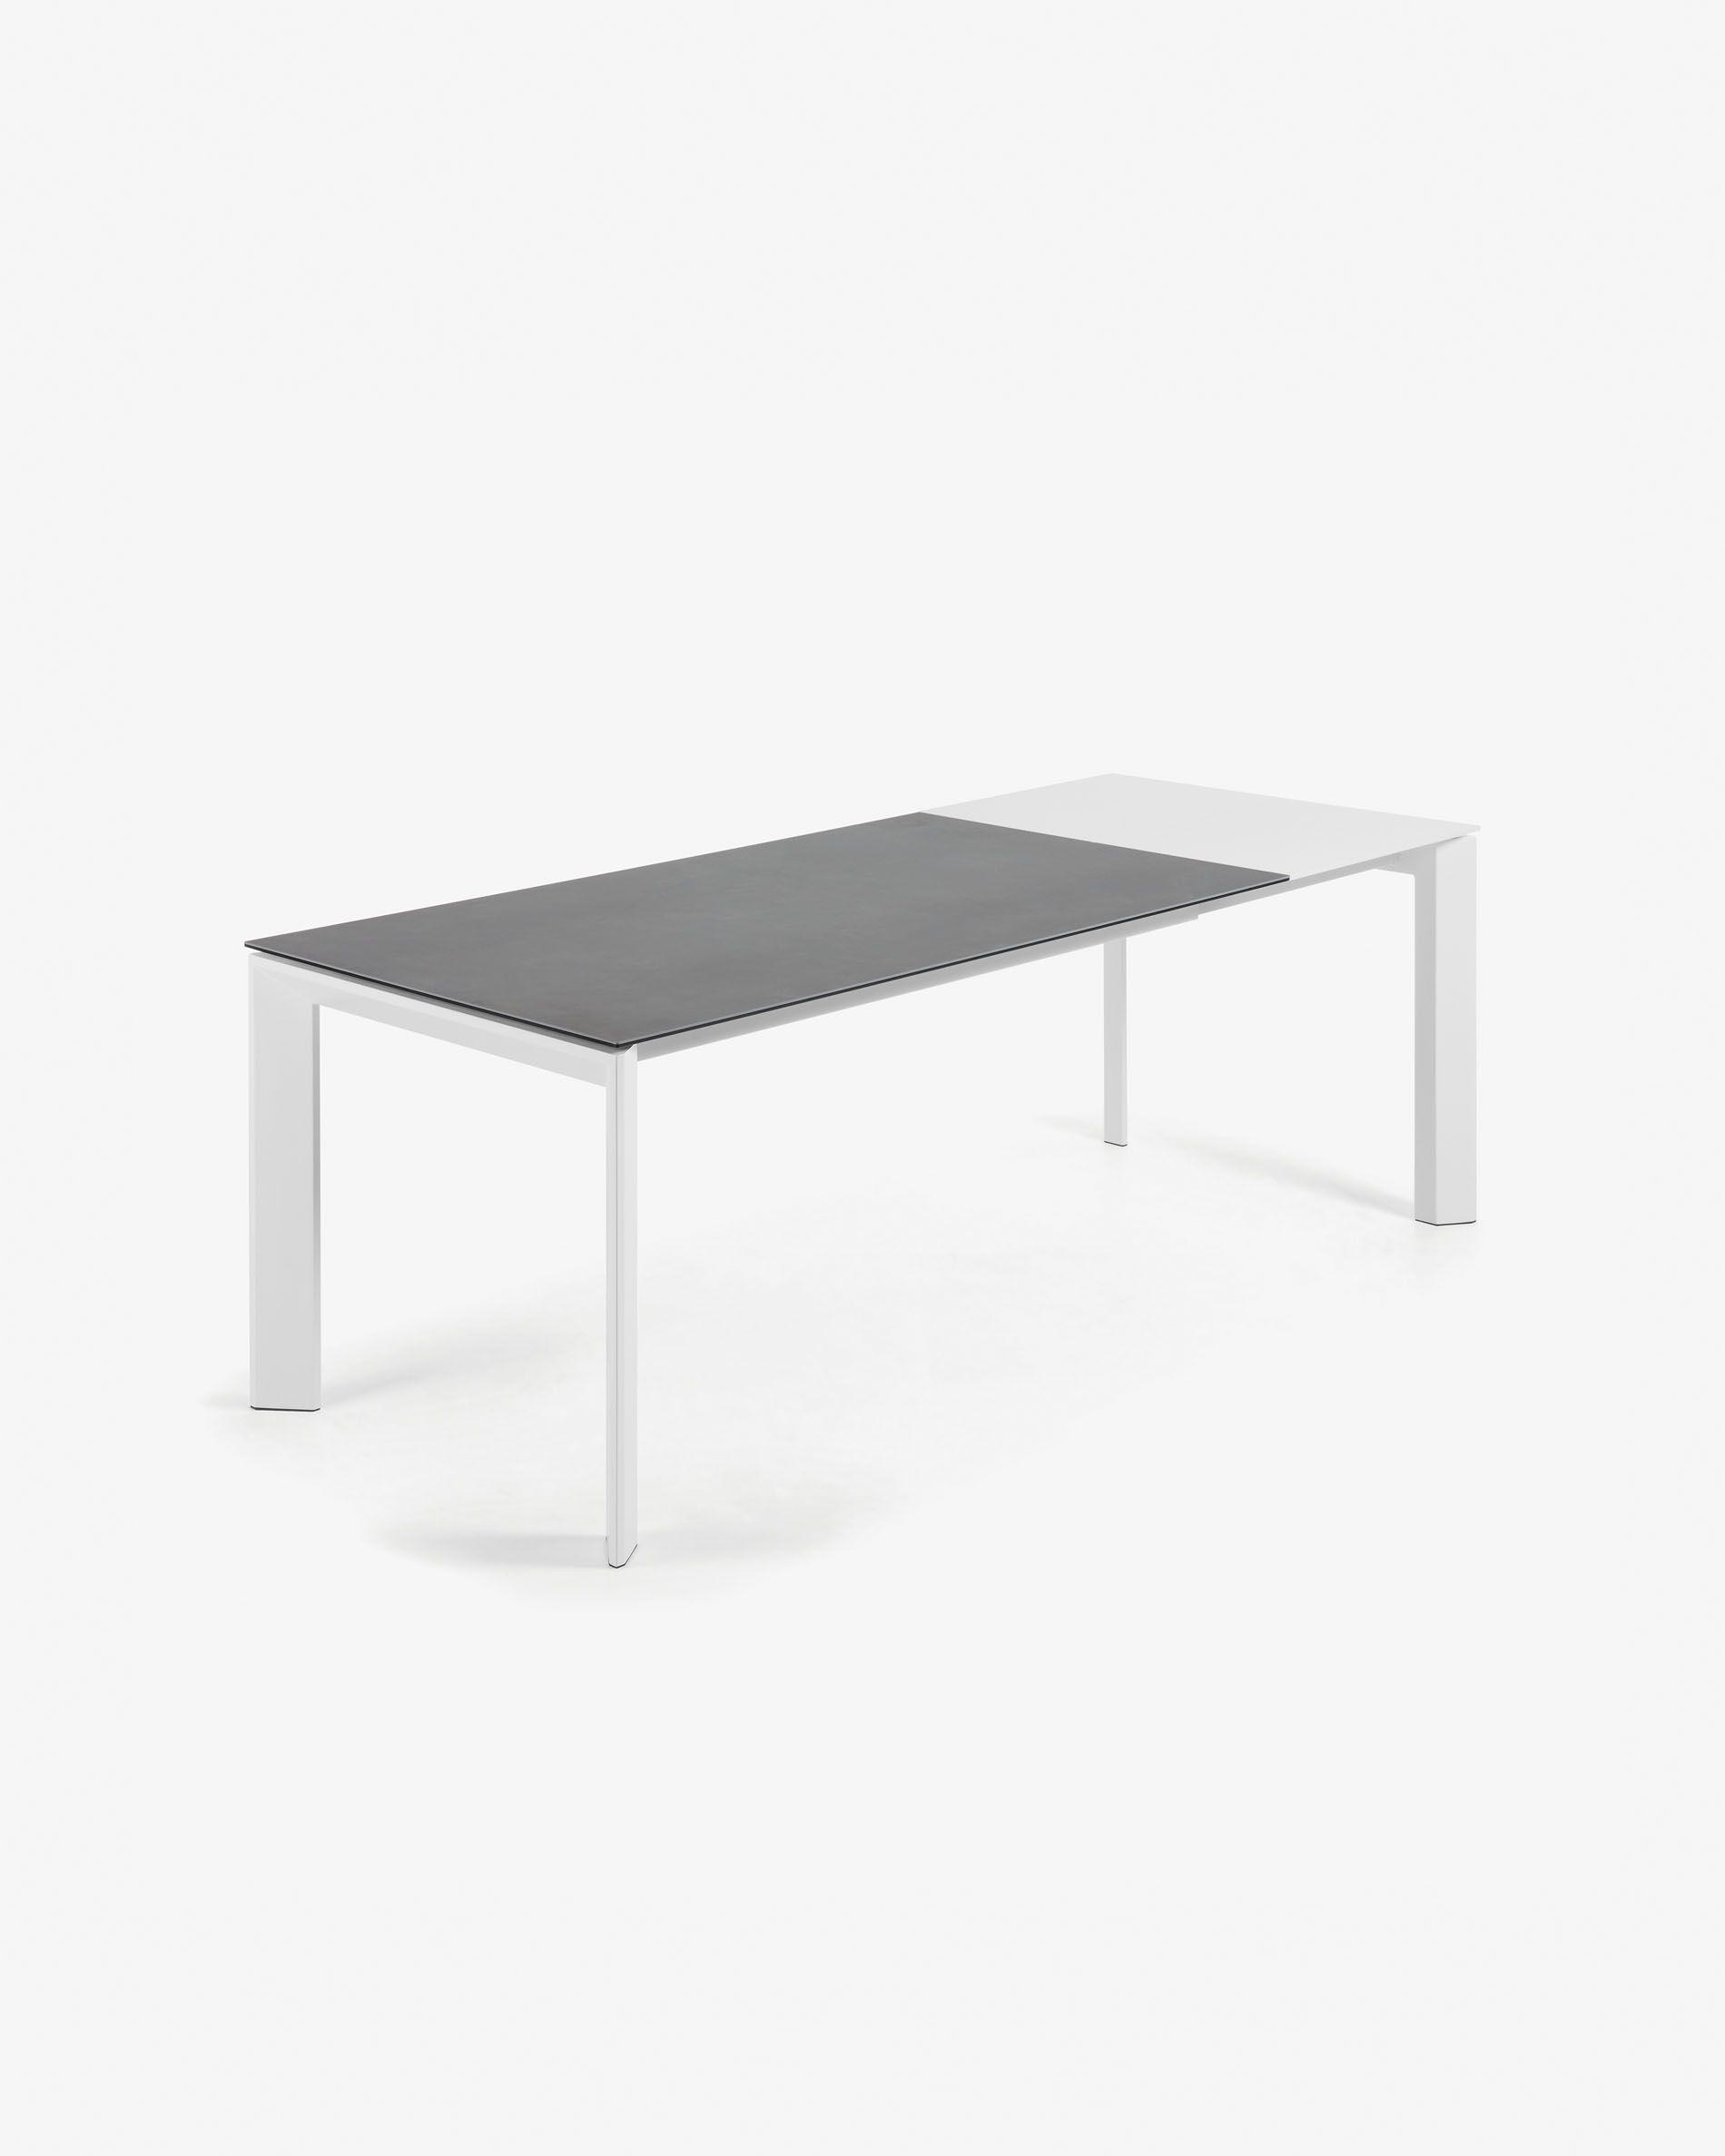 Table Extensible Exterieur Inspirant Table Extensible Axis 160 220 Cm Gr¨s Cérame Finition